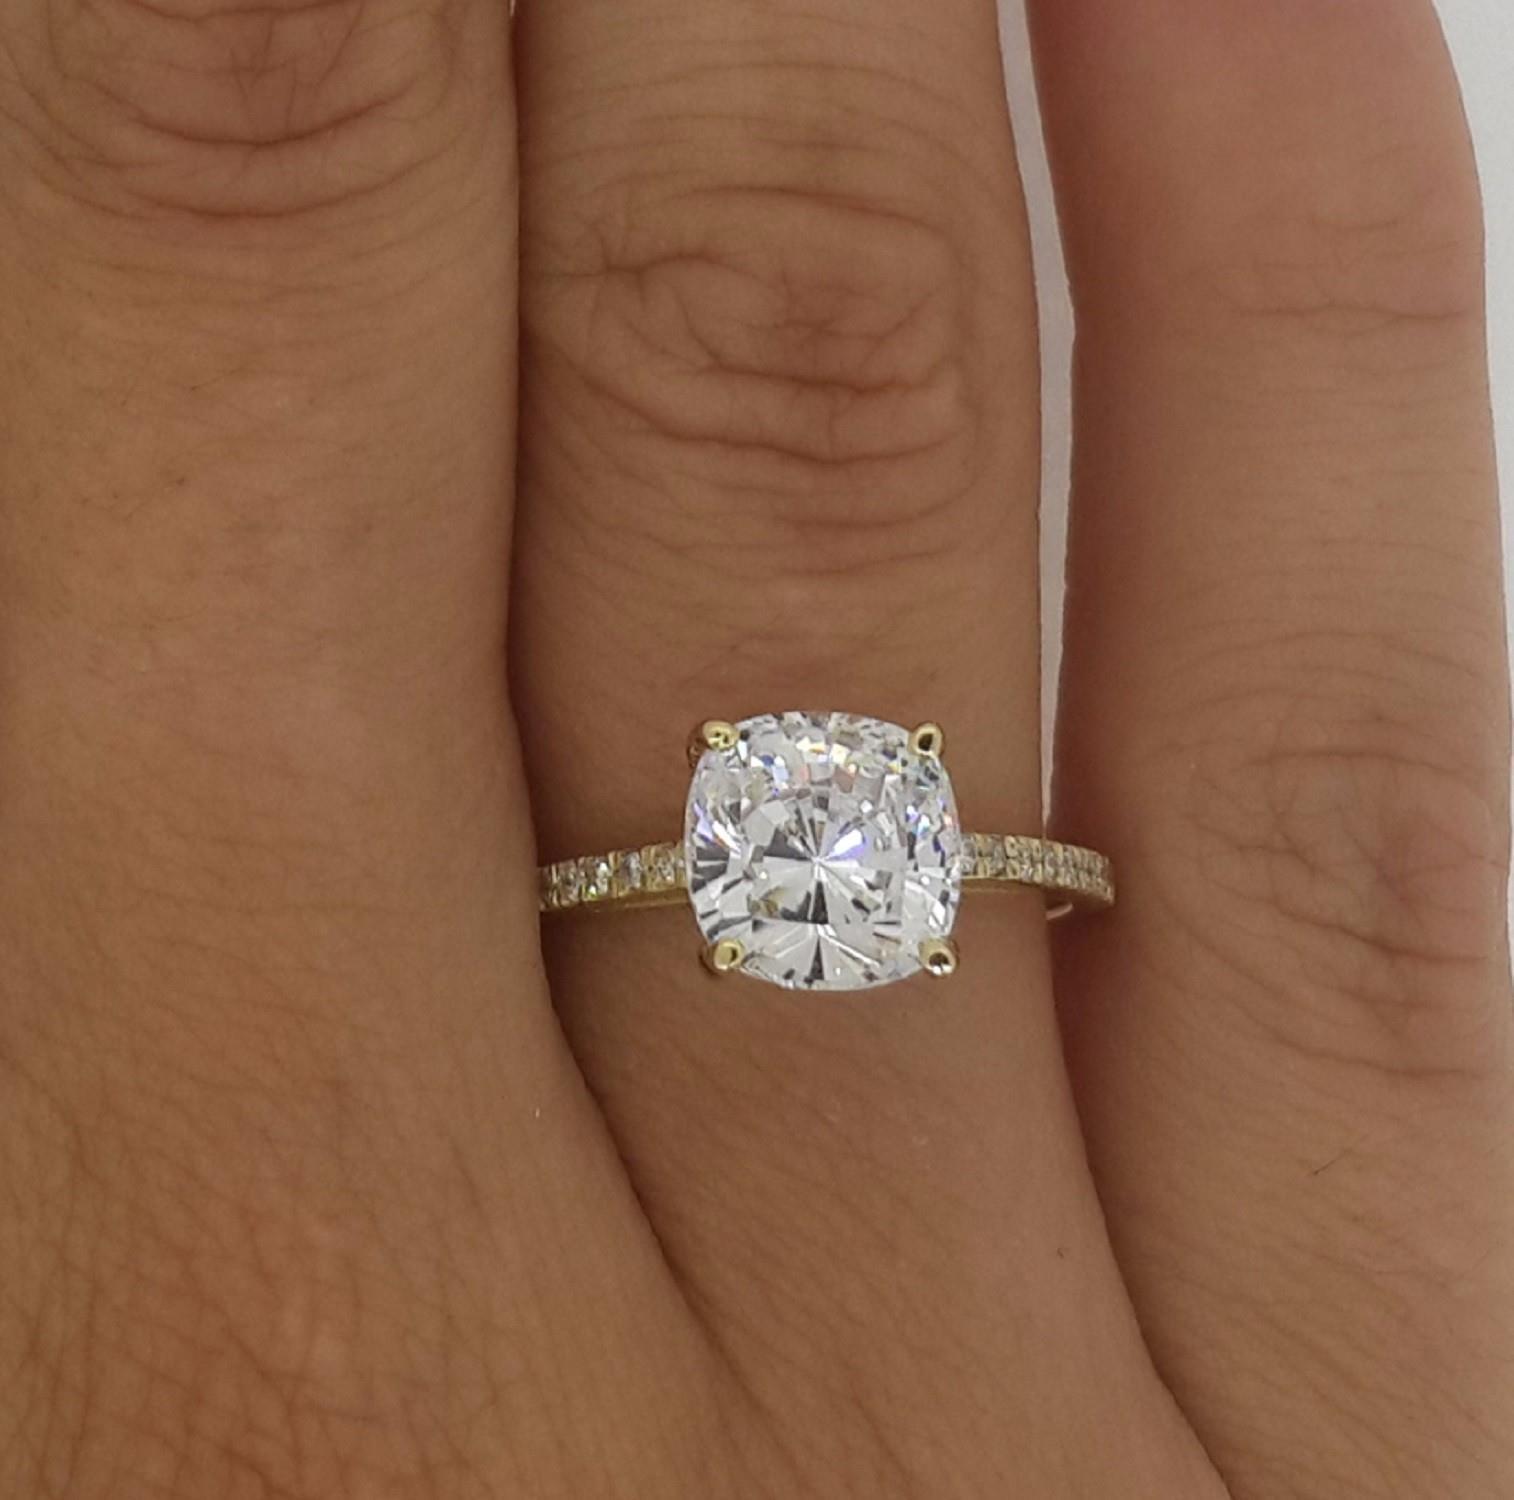 2 5 ct enhanced vs2 f cushion cut diamond engagement ring. Black Bedroom Furniture Sets. Home Design Ideas